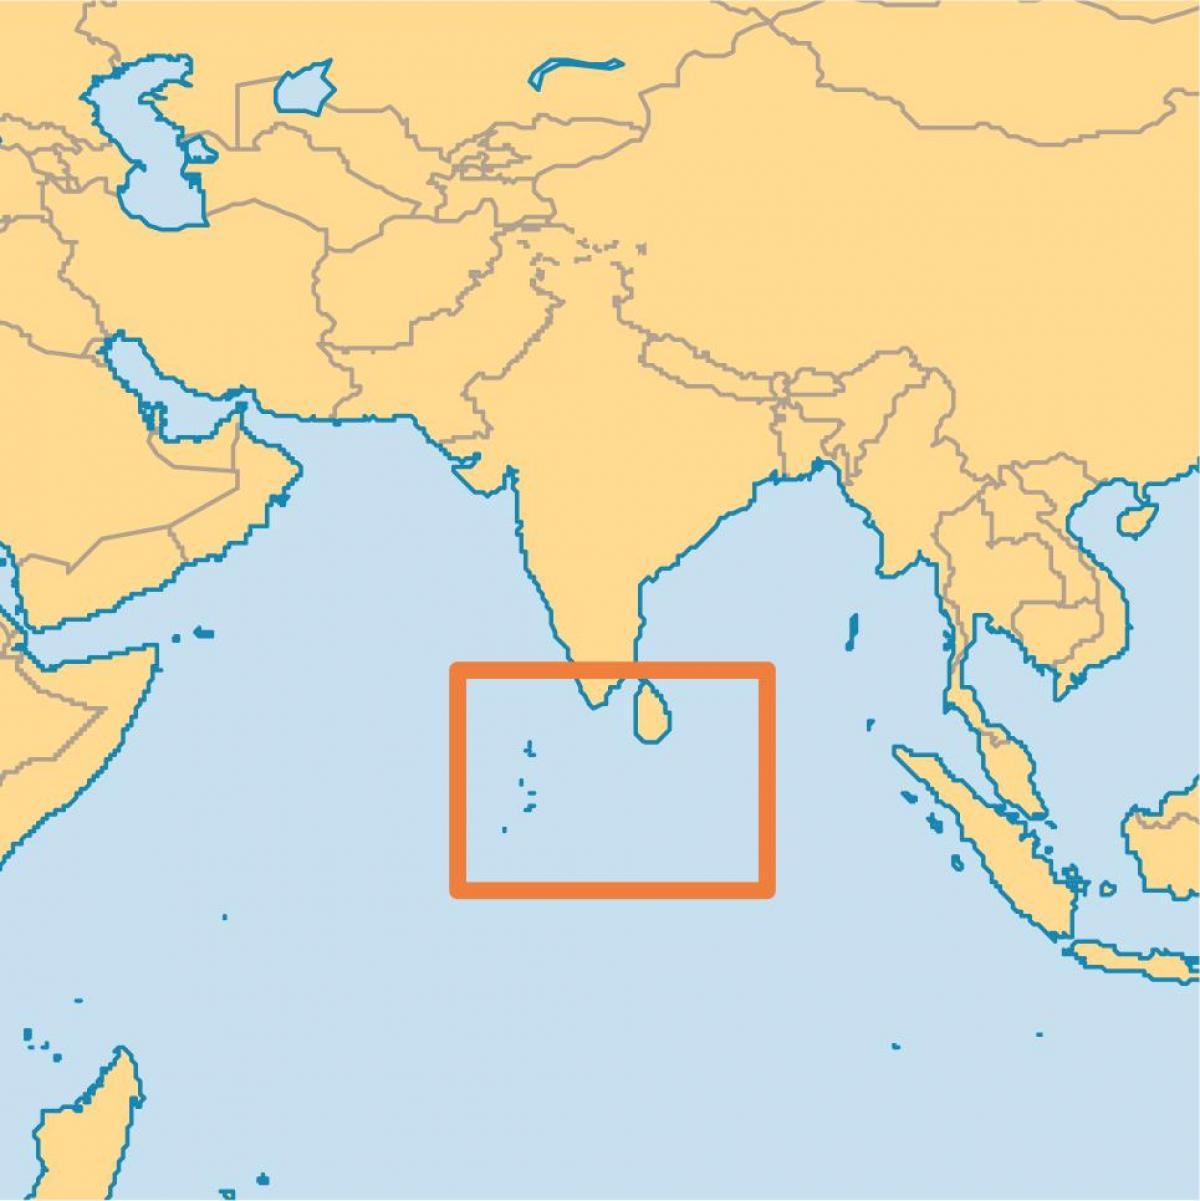 World Map Maldives Islands Maldives Island Location On World Map